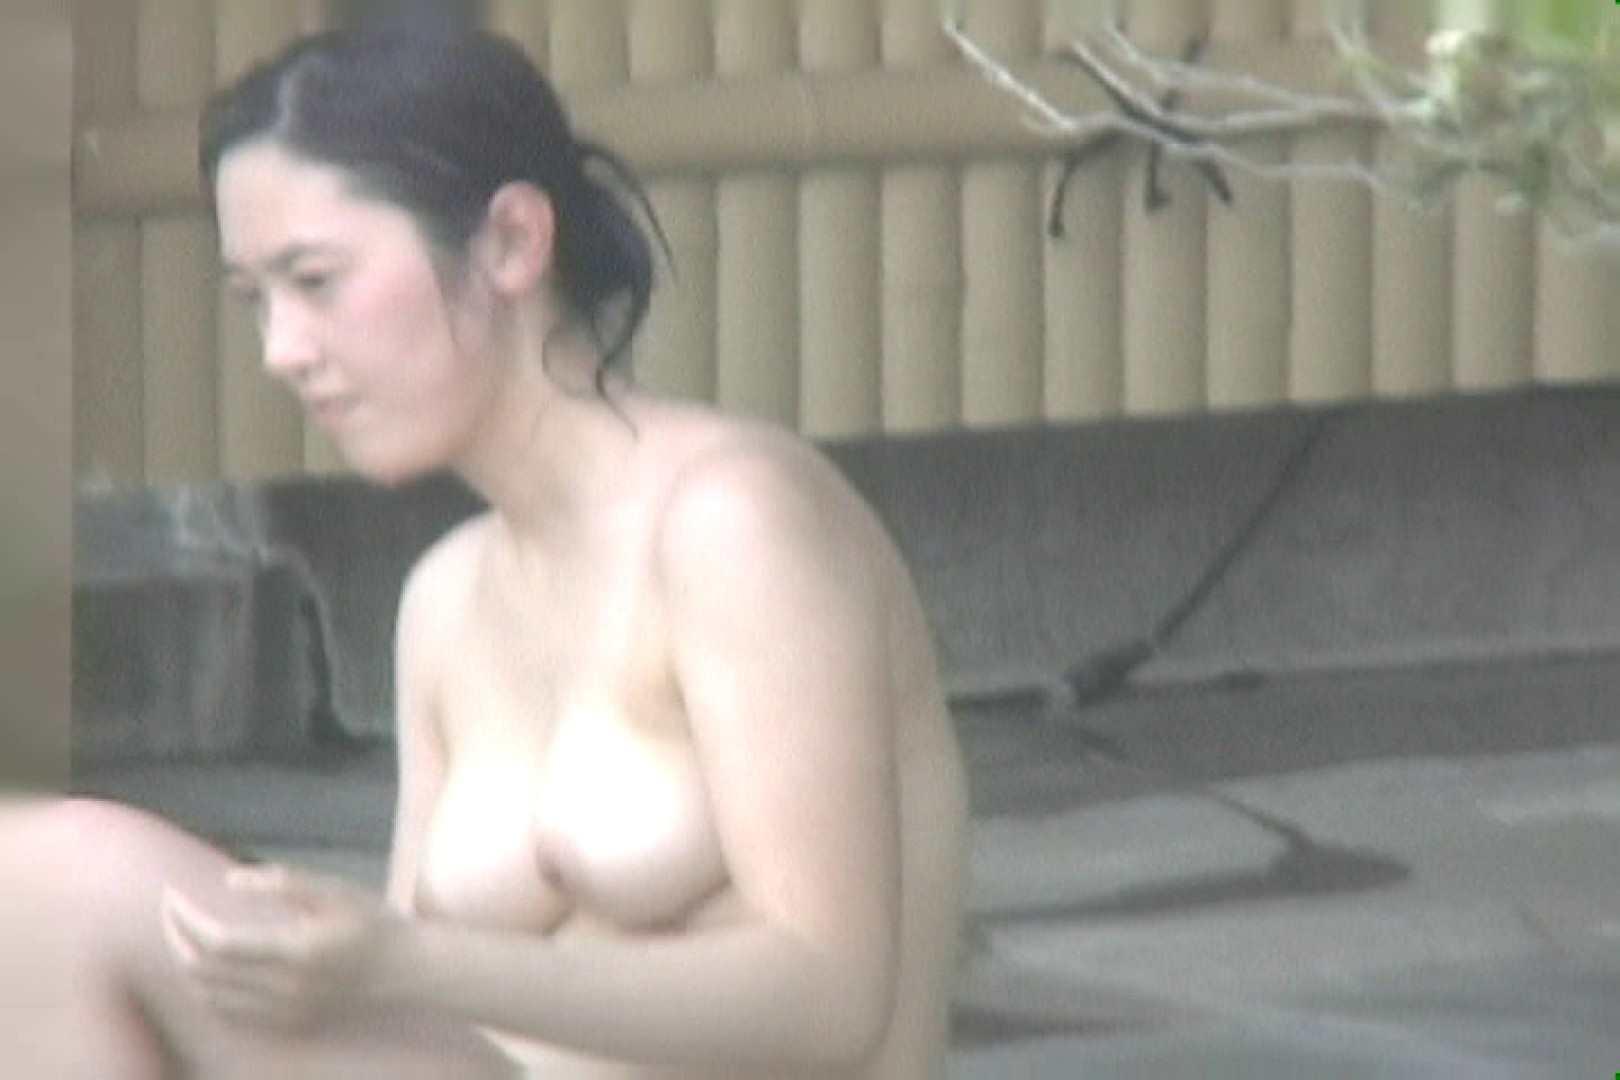 Aquaな露天風呂Vol.691 美しいOLの裸体 性交動画流出 75pic 8